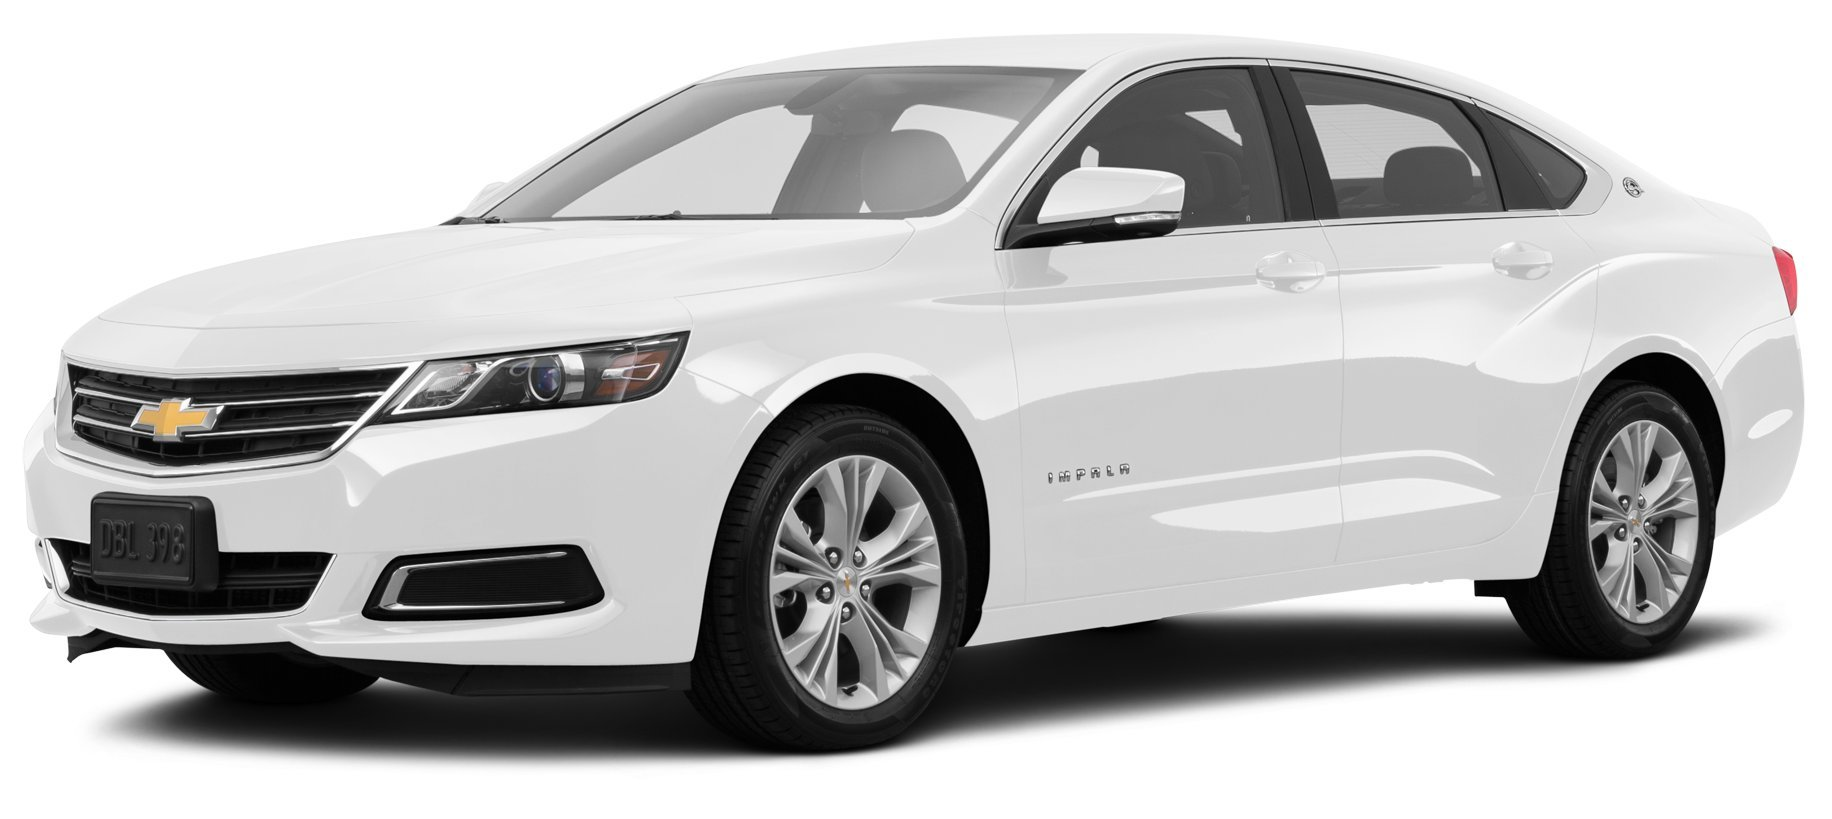 2016 Chevrolet Impala Cng 3lt >> 2015 Chevrolet Impala Lt 4 Door Sedan Summit White